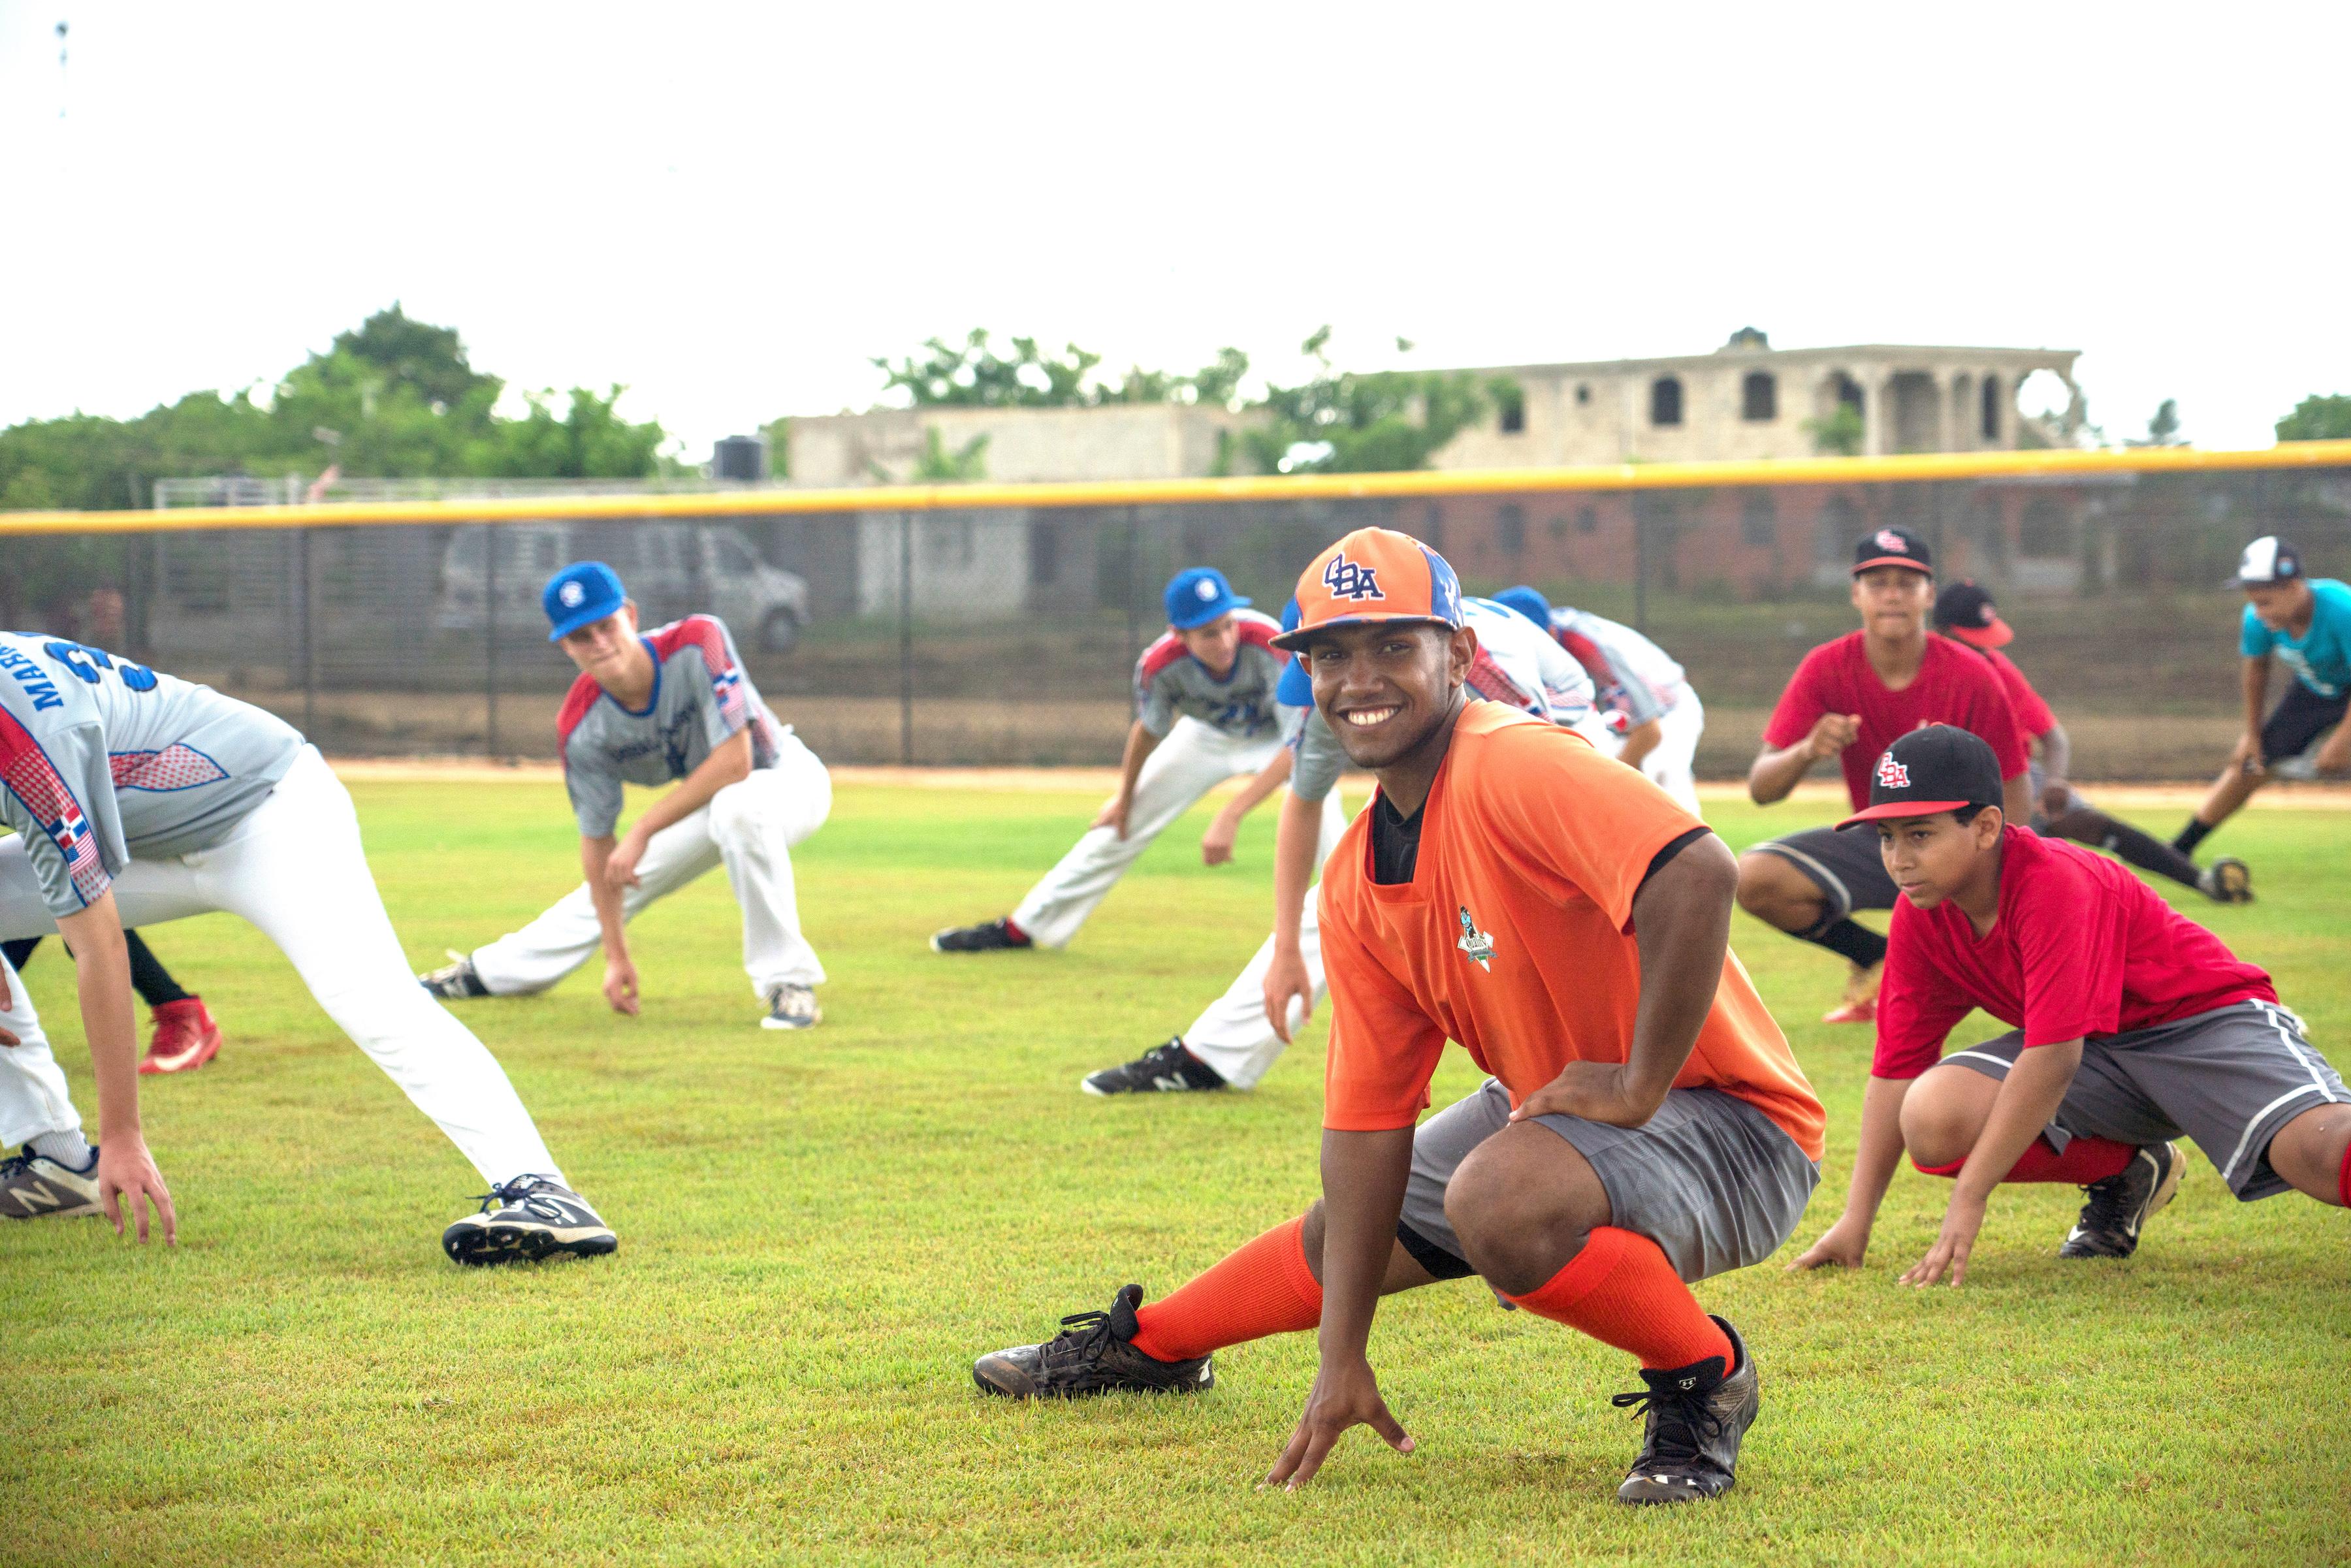 Dominican Republic Baseball Immersion